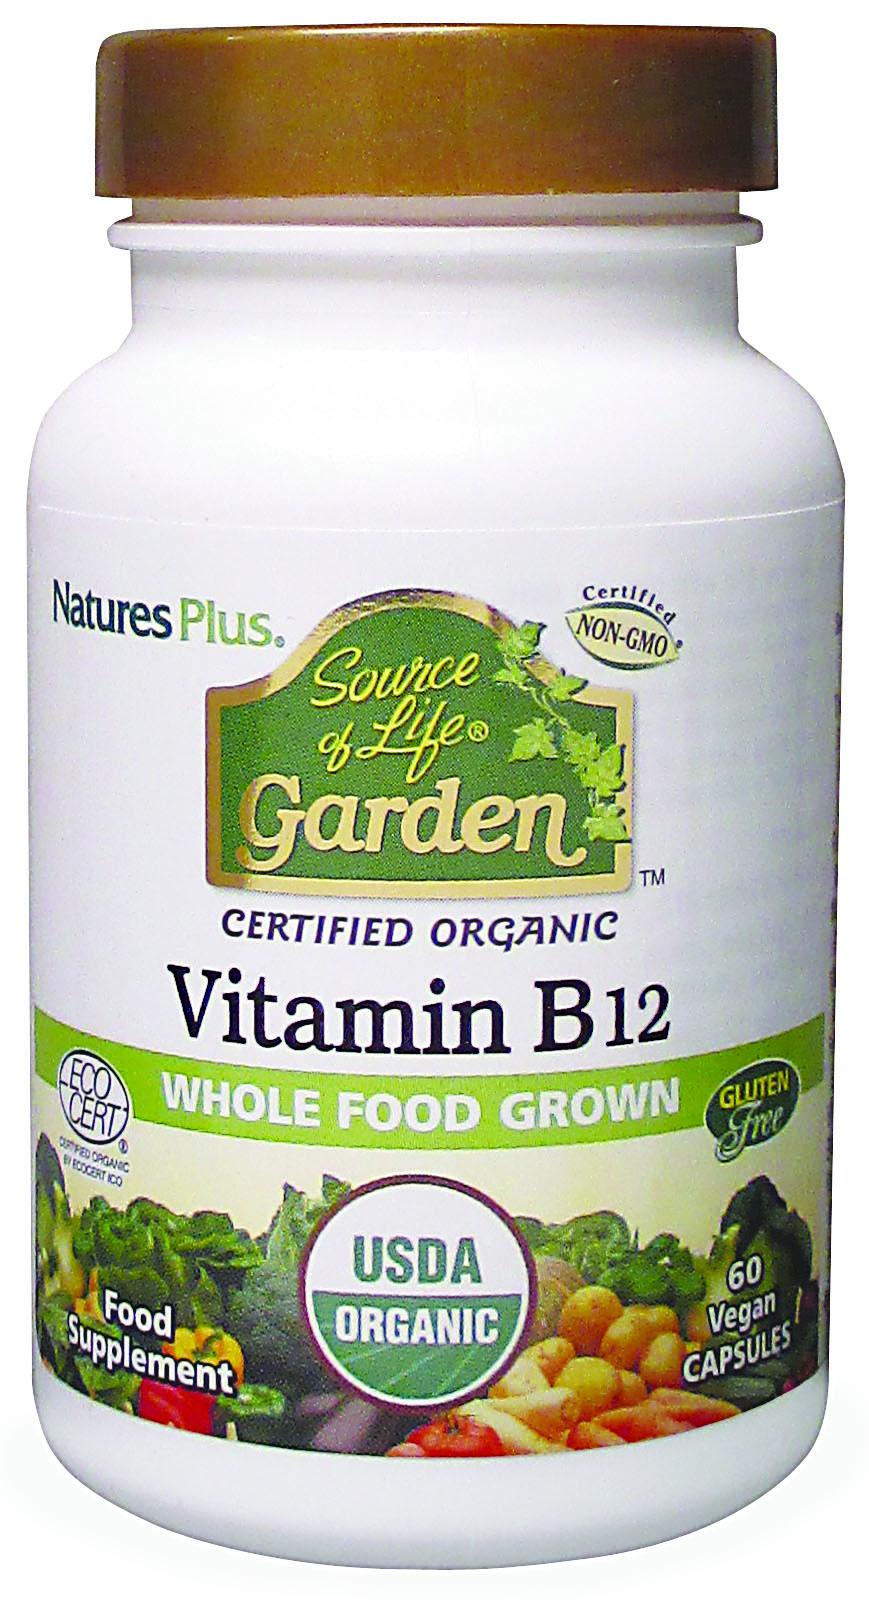 Source of Life Garden Certified Organic Vitamin B12 60's